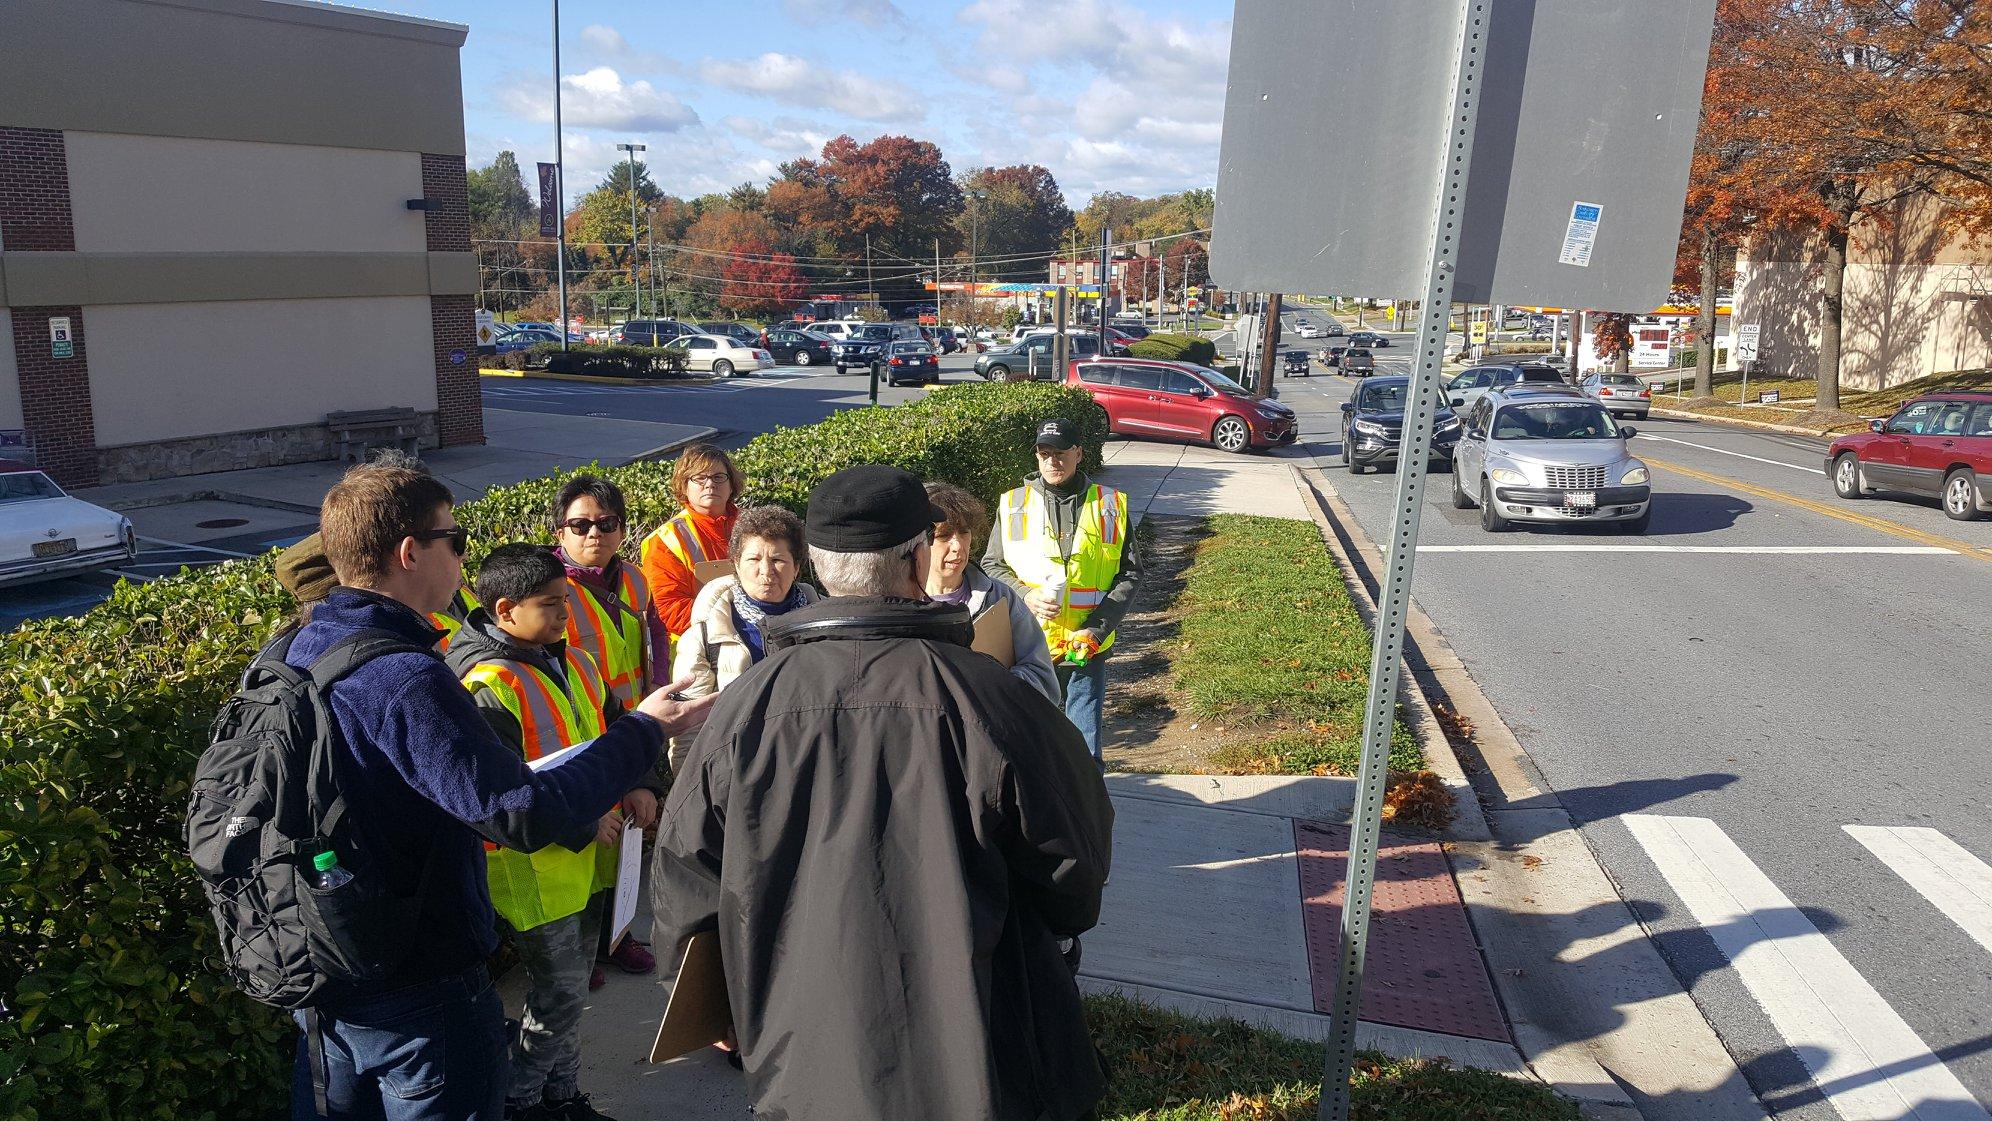 Pedestrian audit participants discuss a curb ramp and crossing in Aspen Hill.